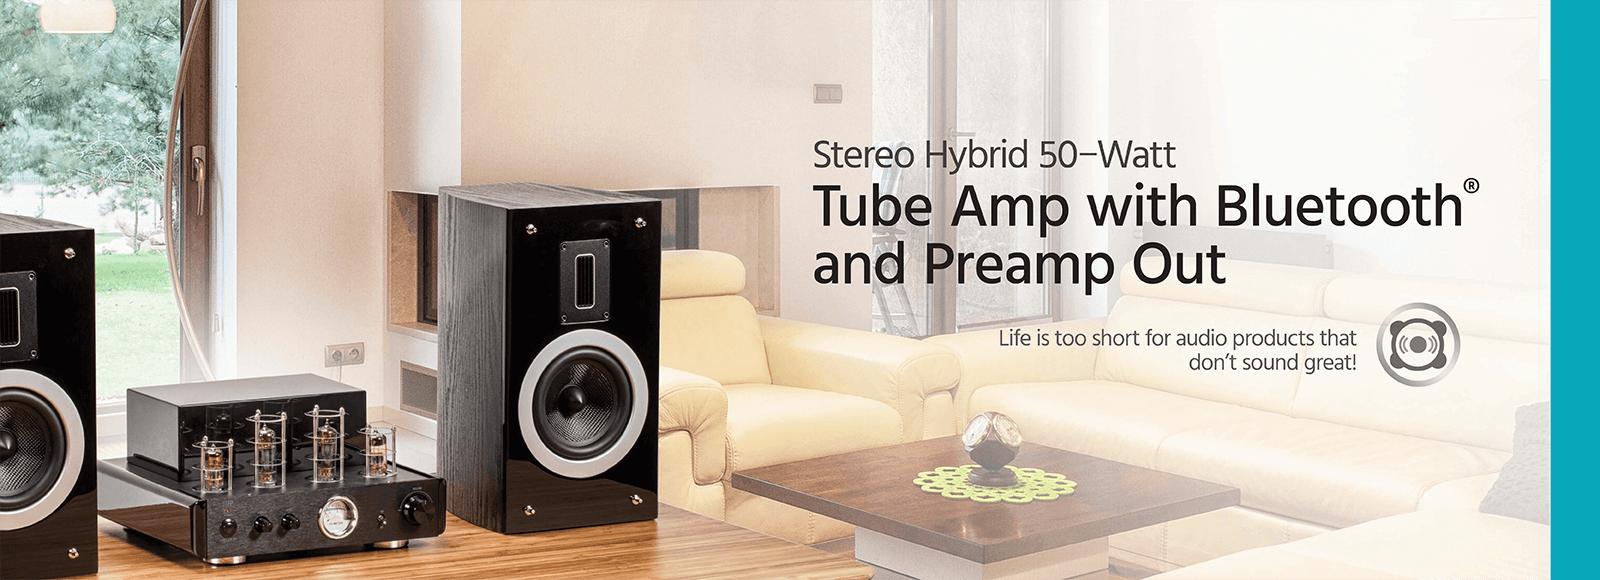 Compact Stereo Hybrid 50-Watt Tube Amp with Bluetooth